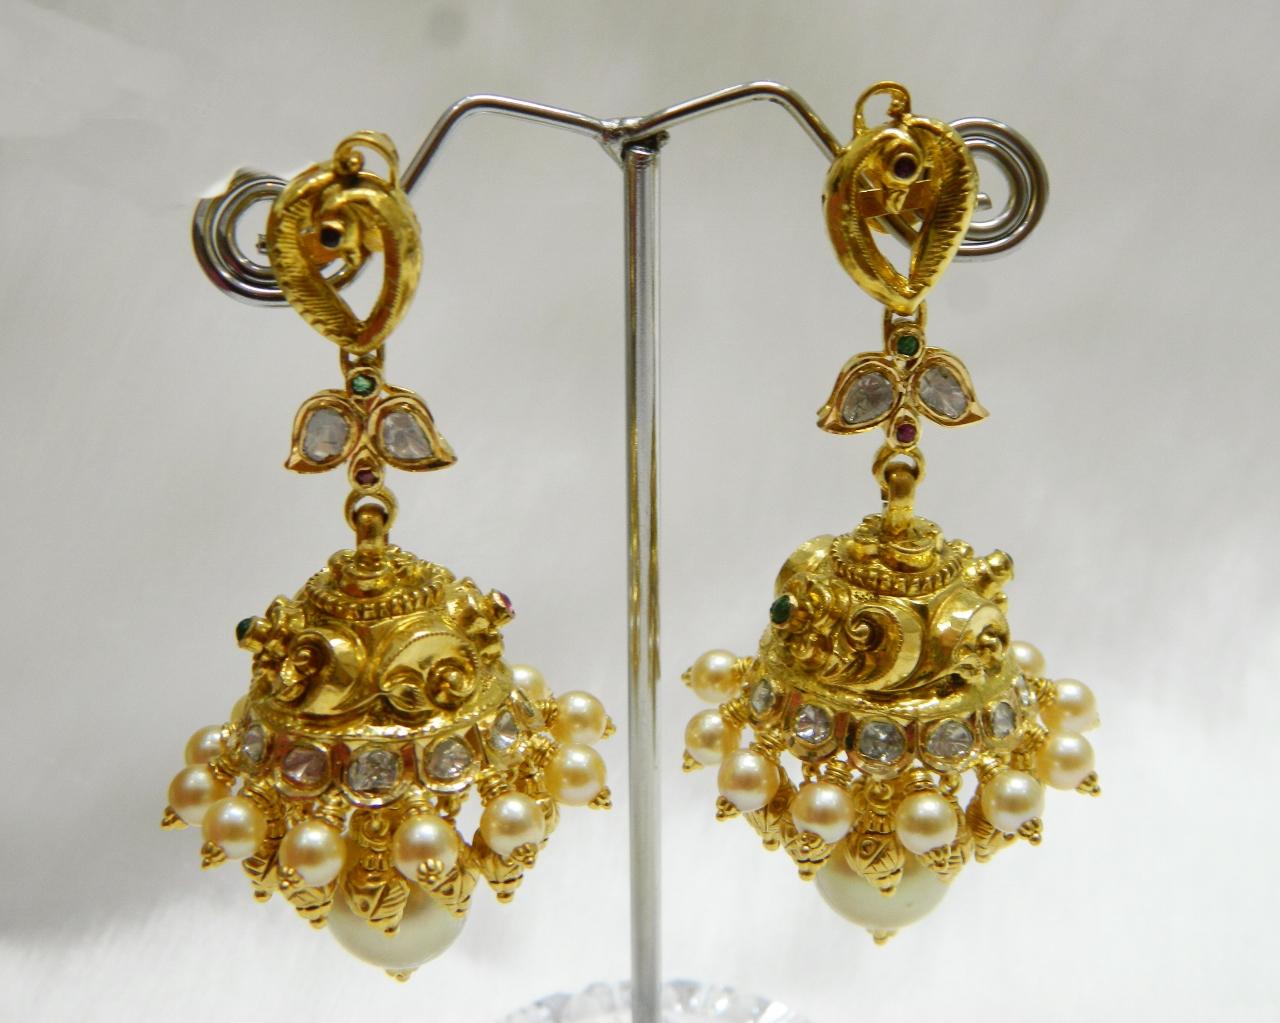 Earrings / Jhumkis / Chandbali - Gold Jewellery Earrings / Jhumkis ...